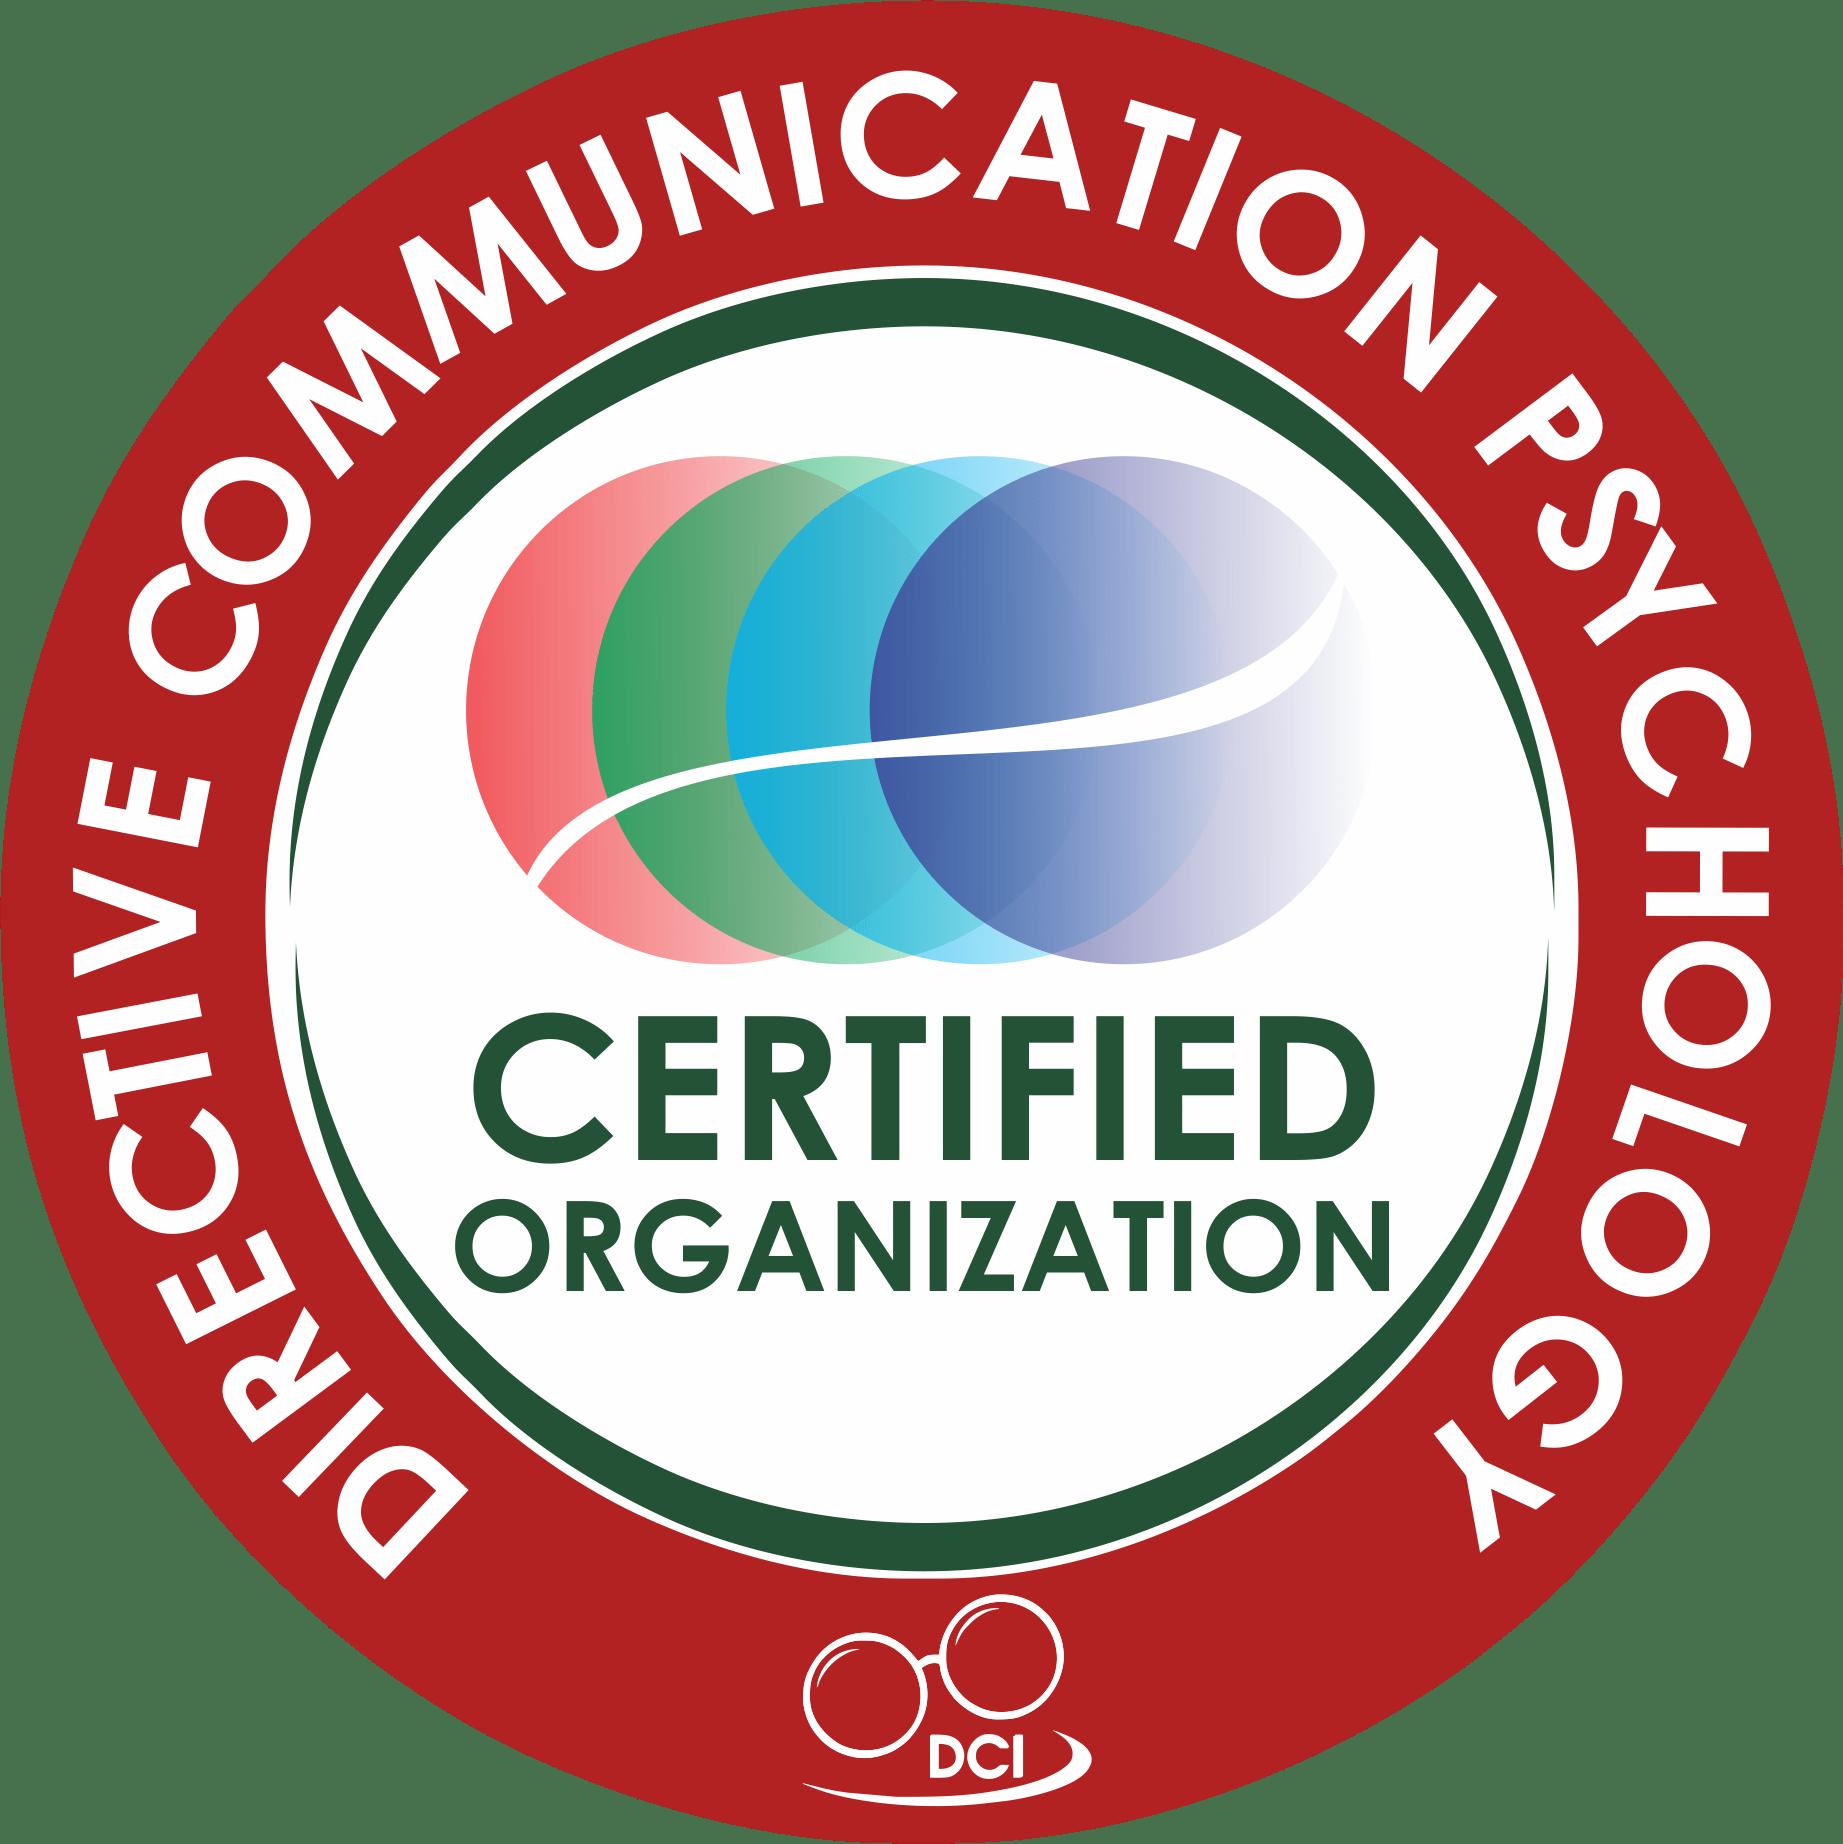 certified-directive-communication-psychology-organization-1